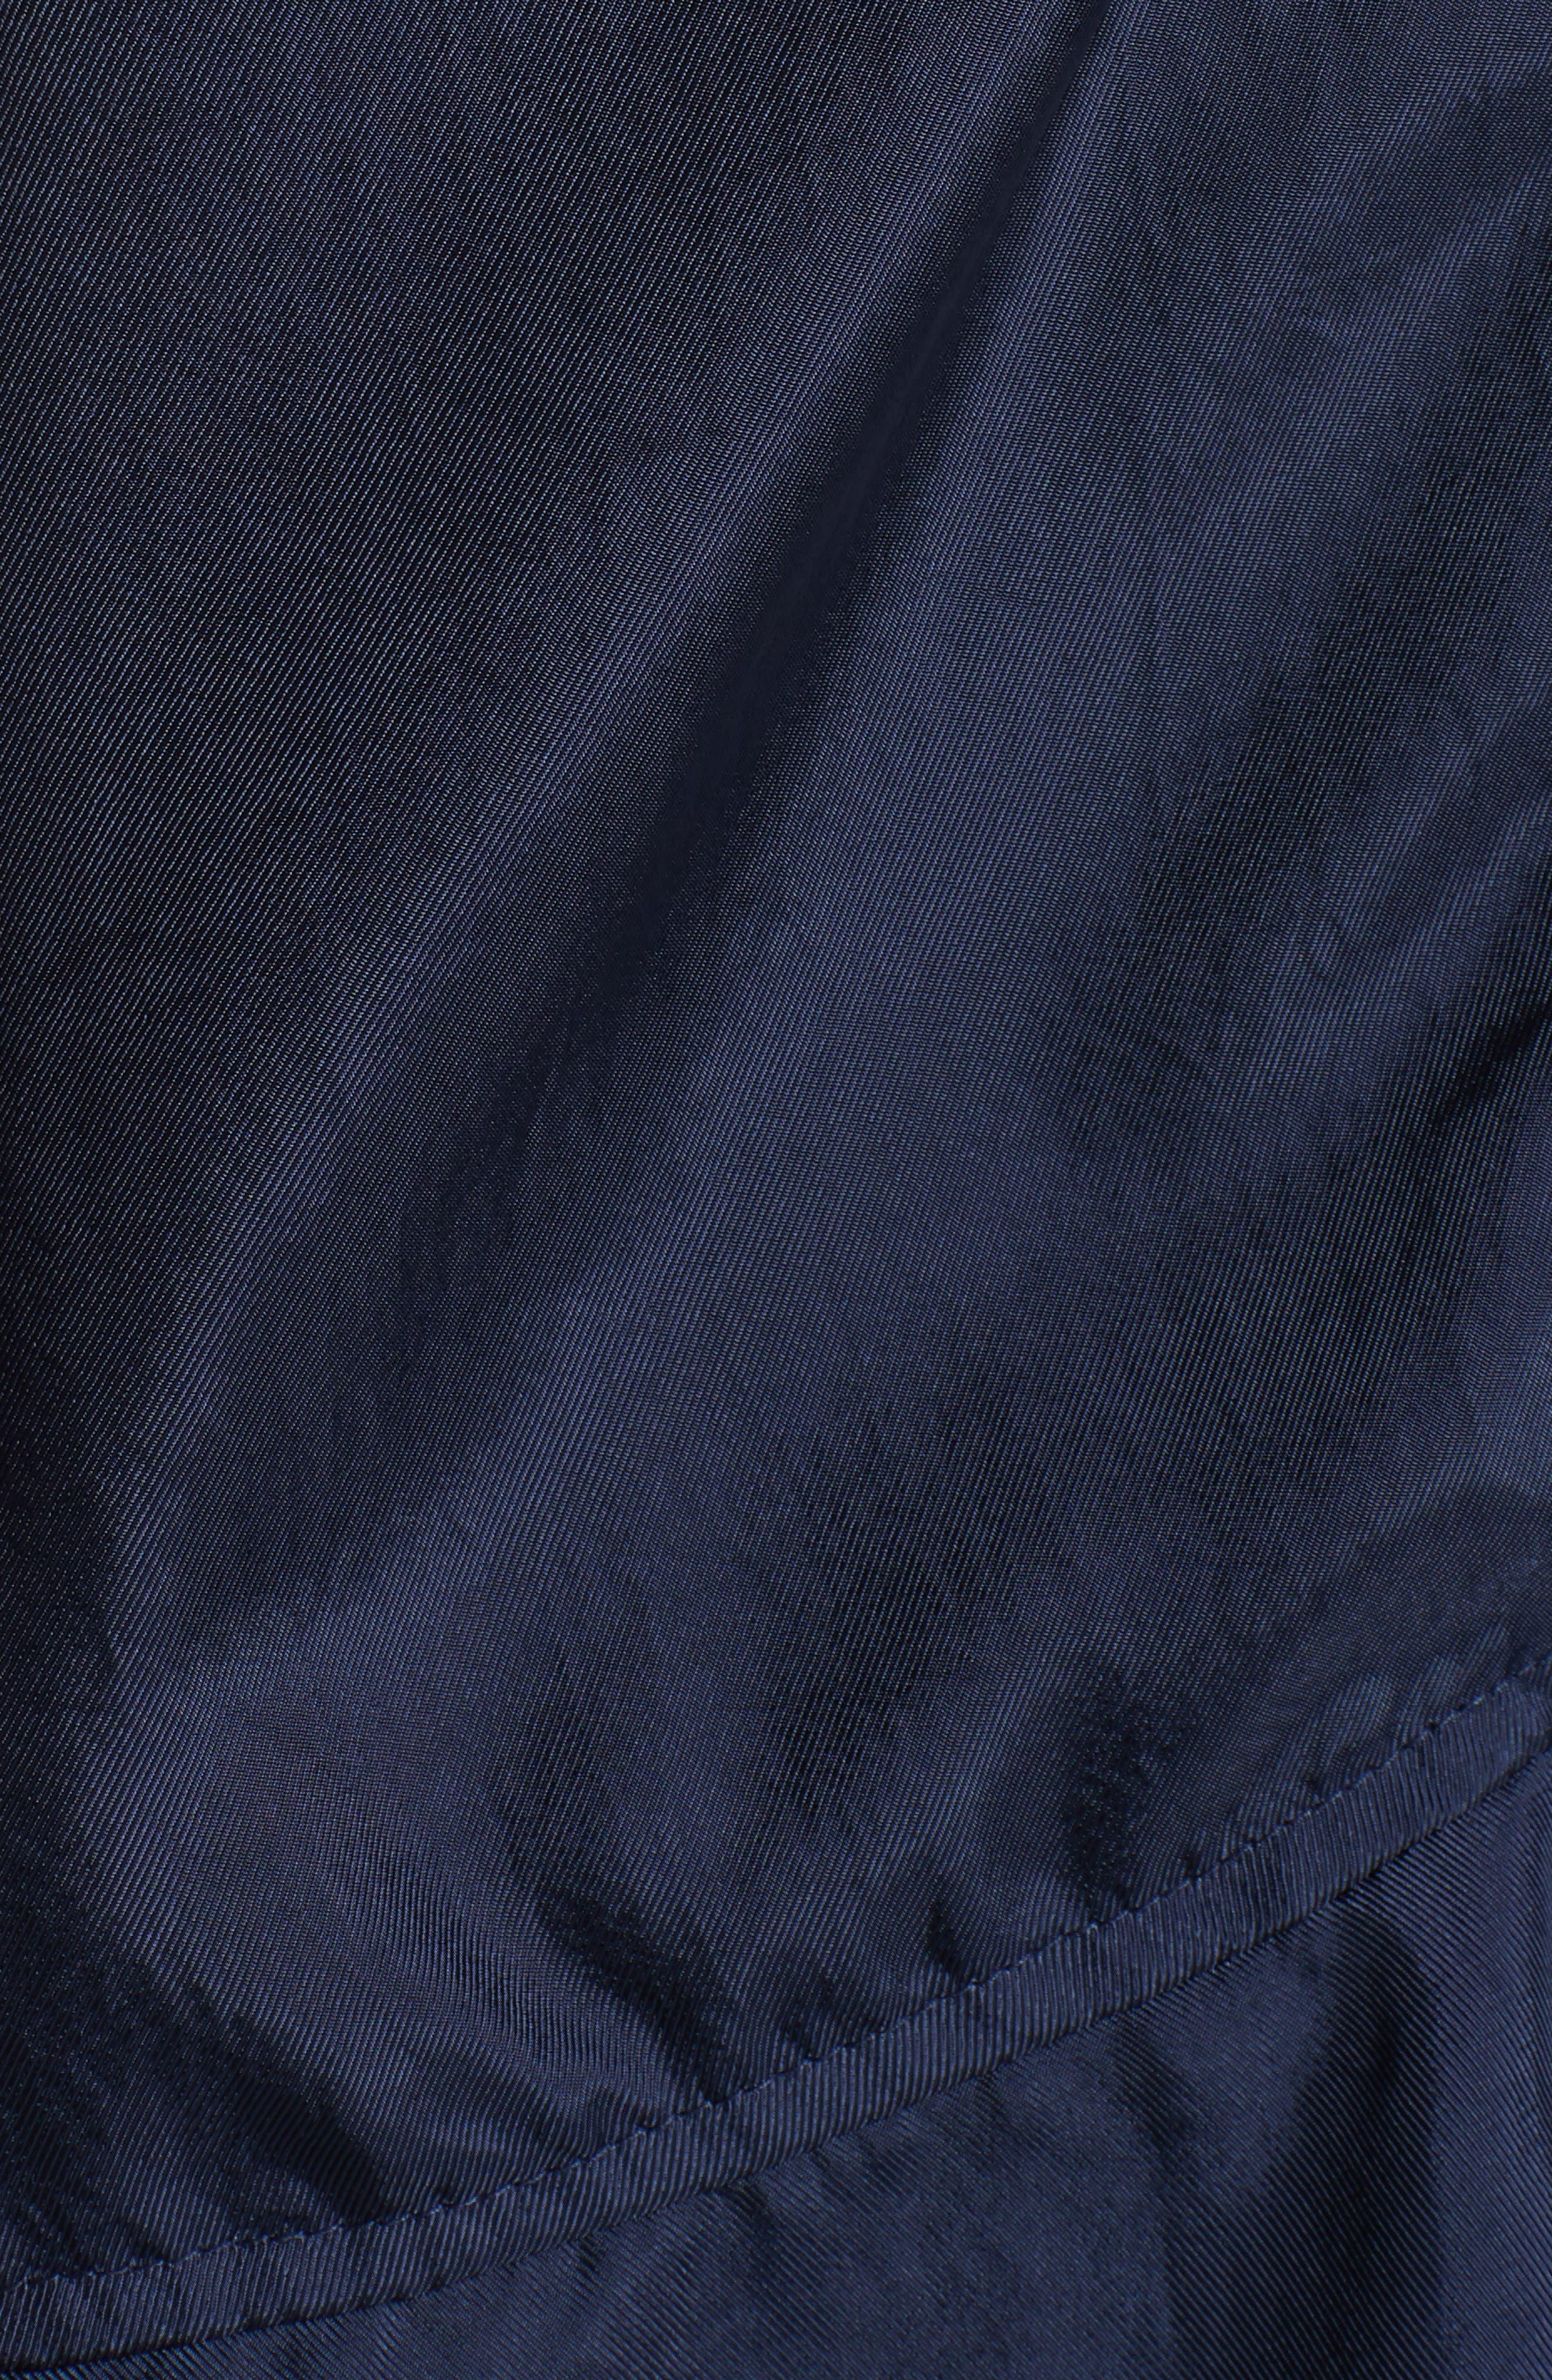 Asymmetrical Hem Camisole,                             Alternate thumbnail 6, color,                             Navy